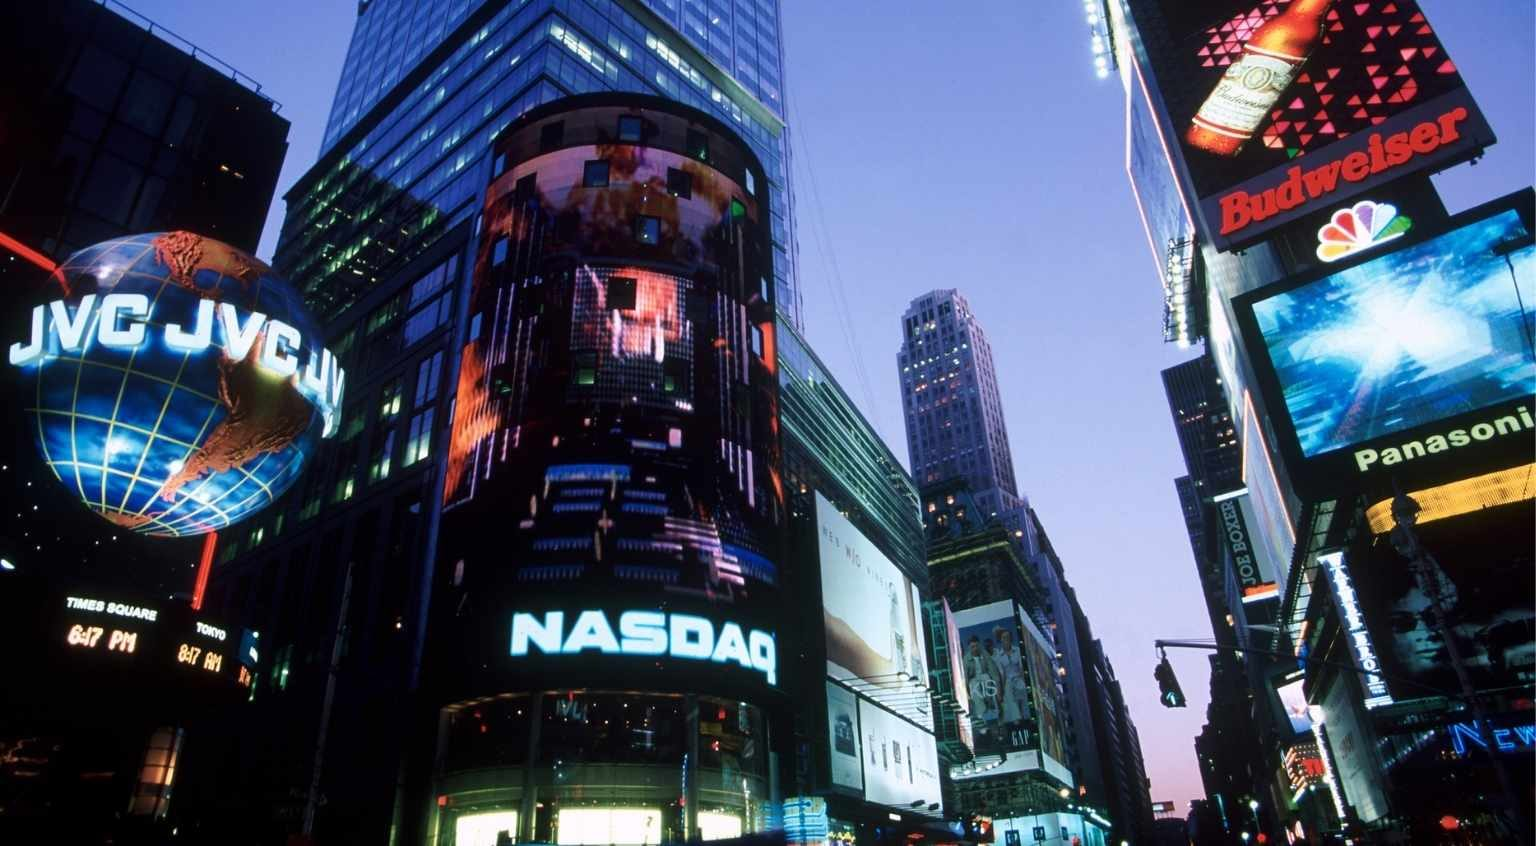 NASDAQ Broadway